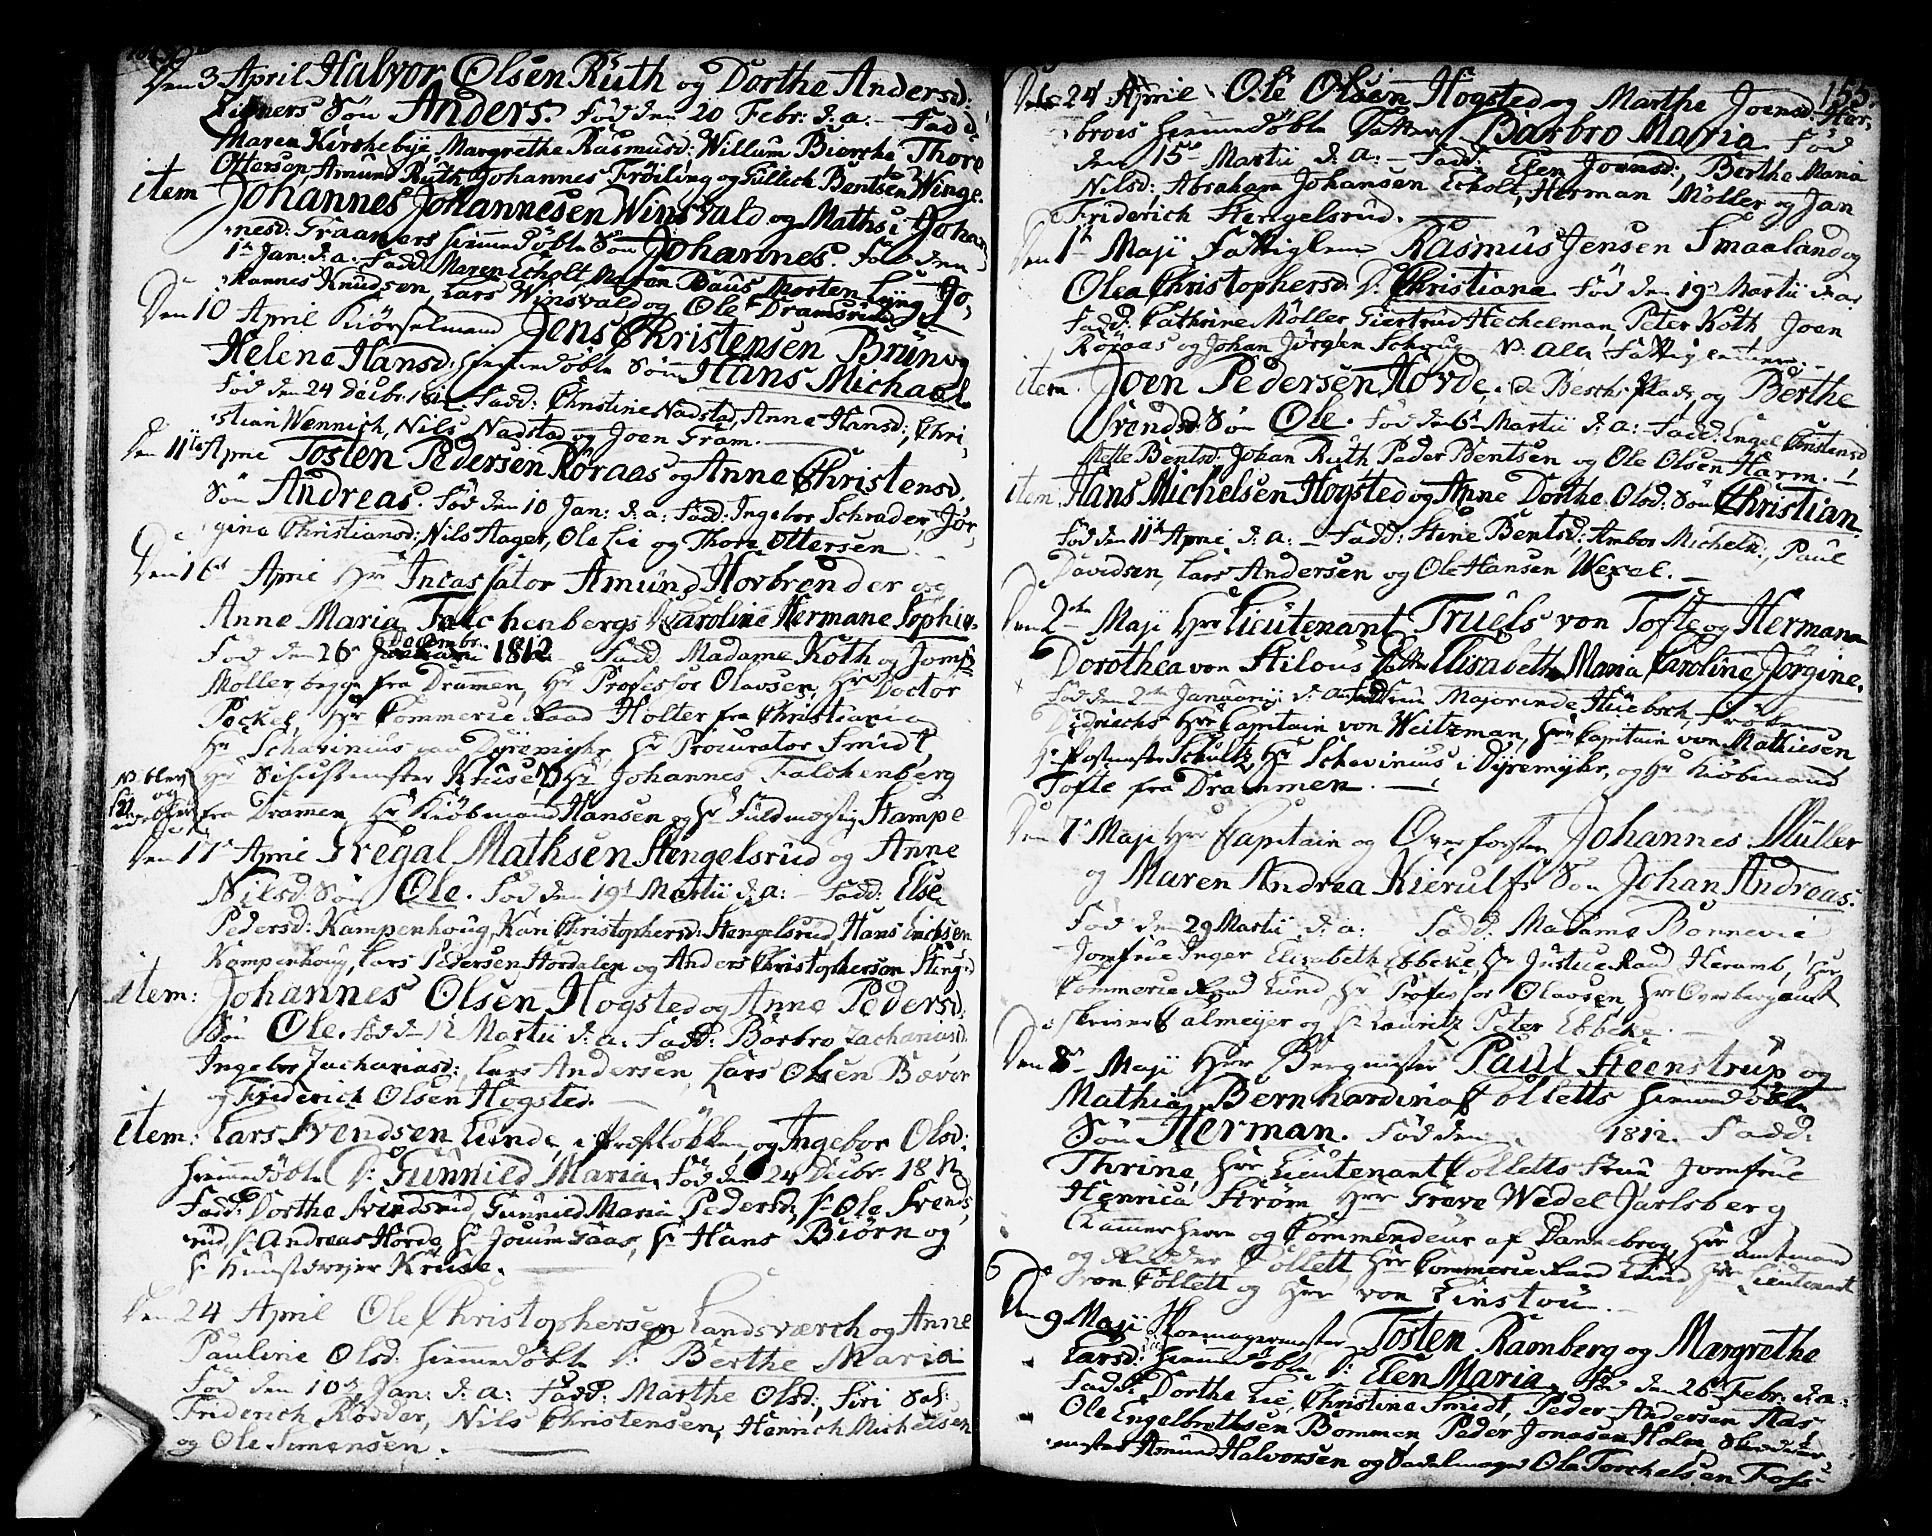 SAKO, Kongsberg kirkebøker, F/Fa/L0007: Parish register (official) no. I 7, 1795-1816, p. 155